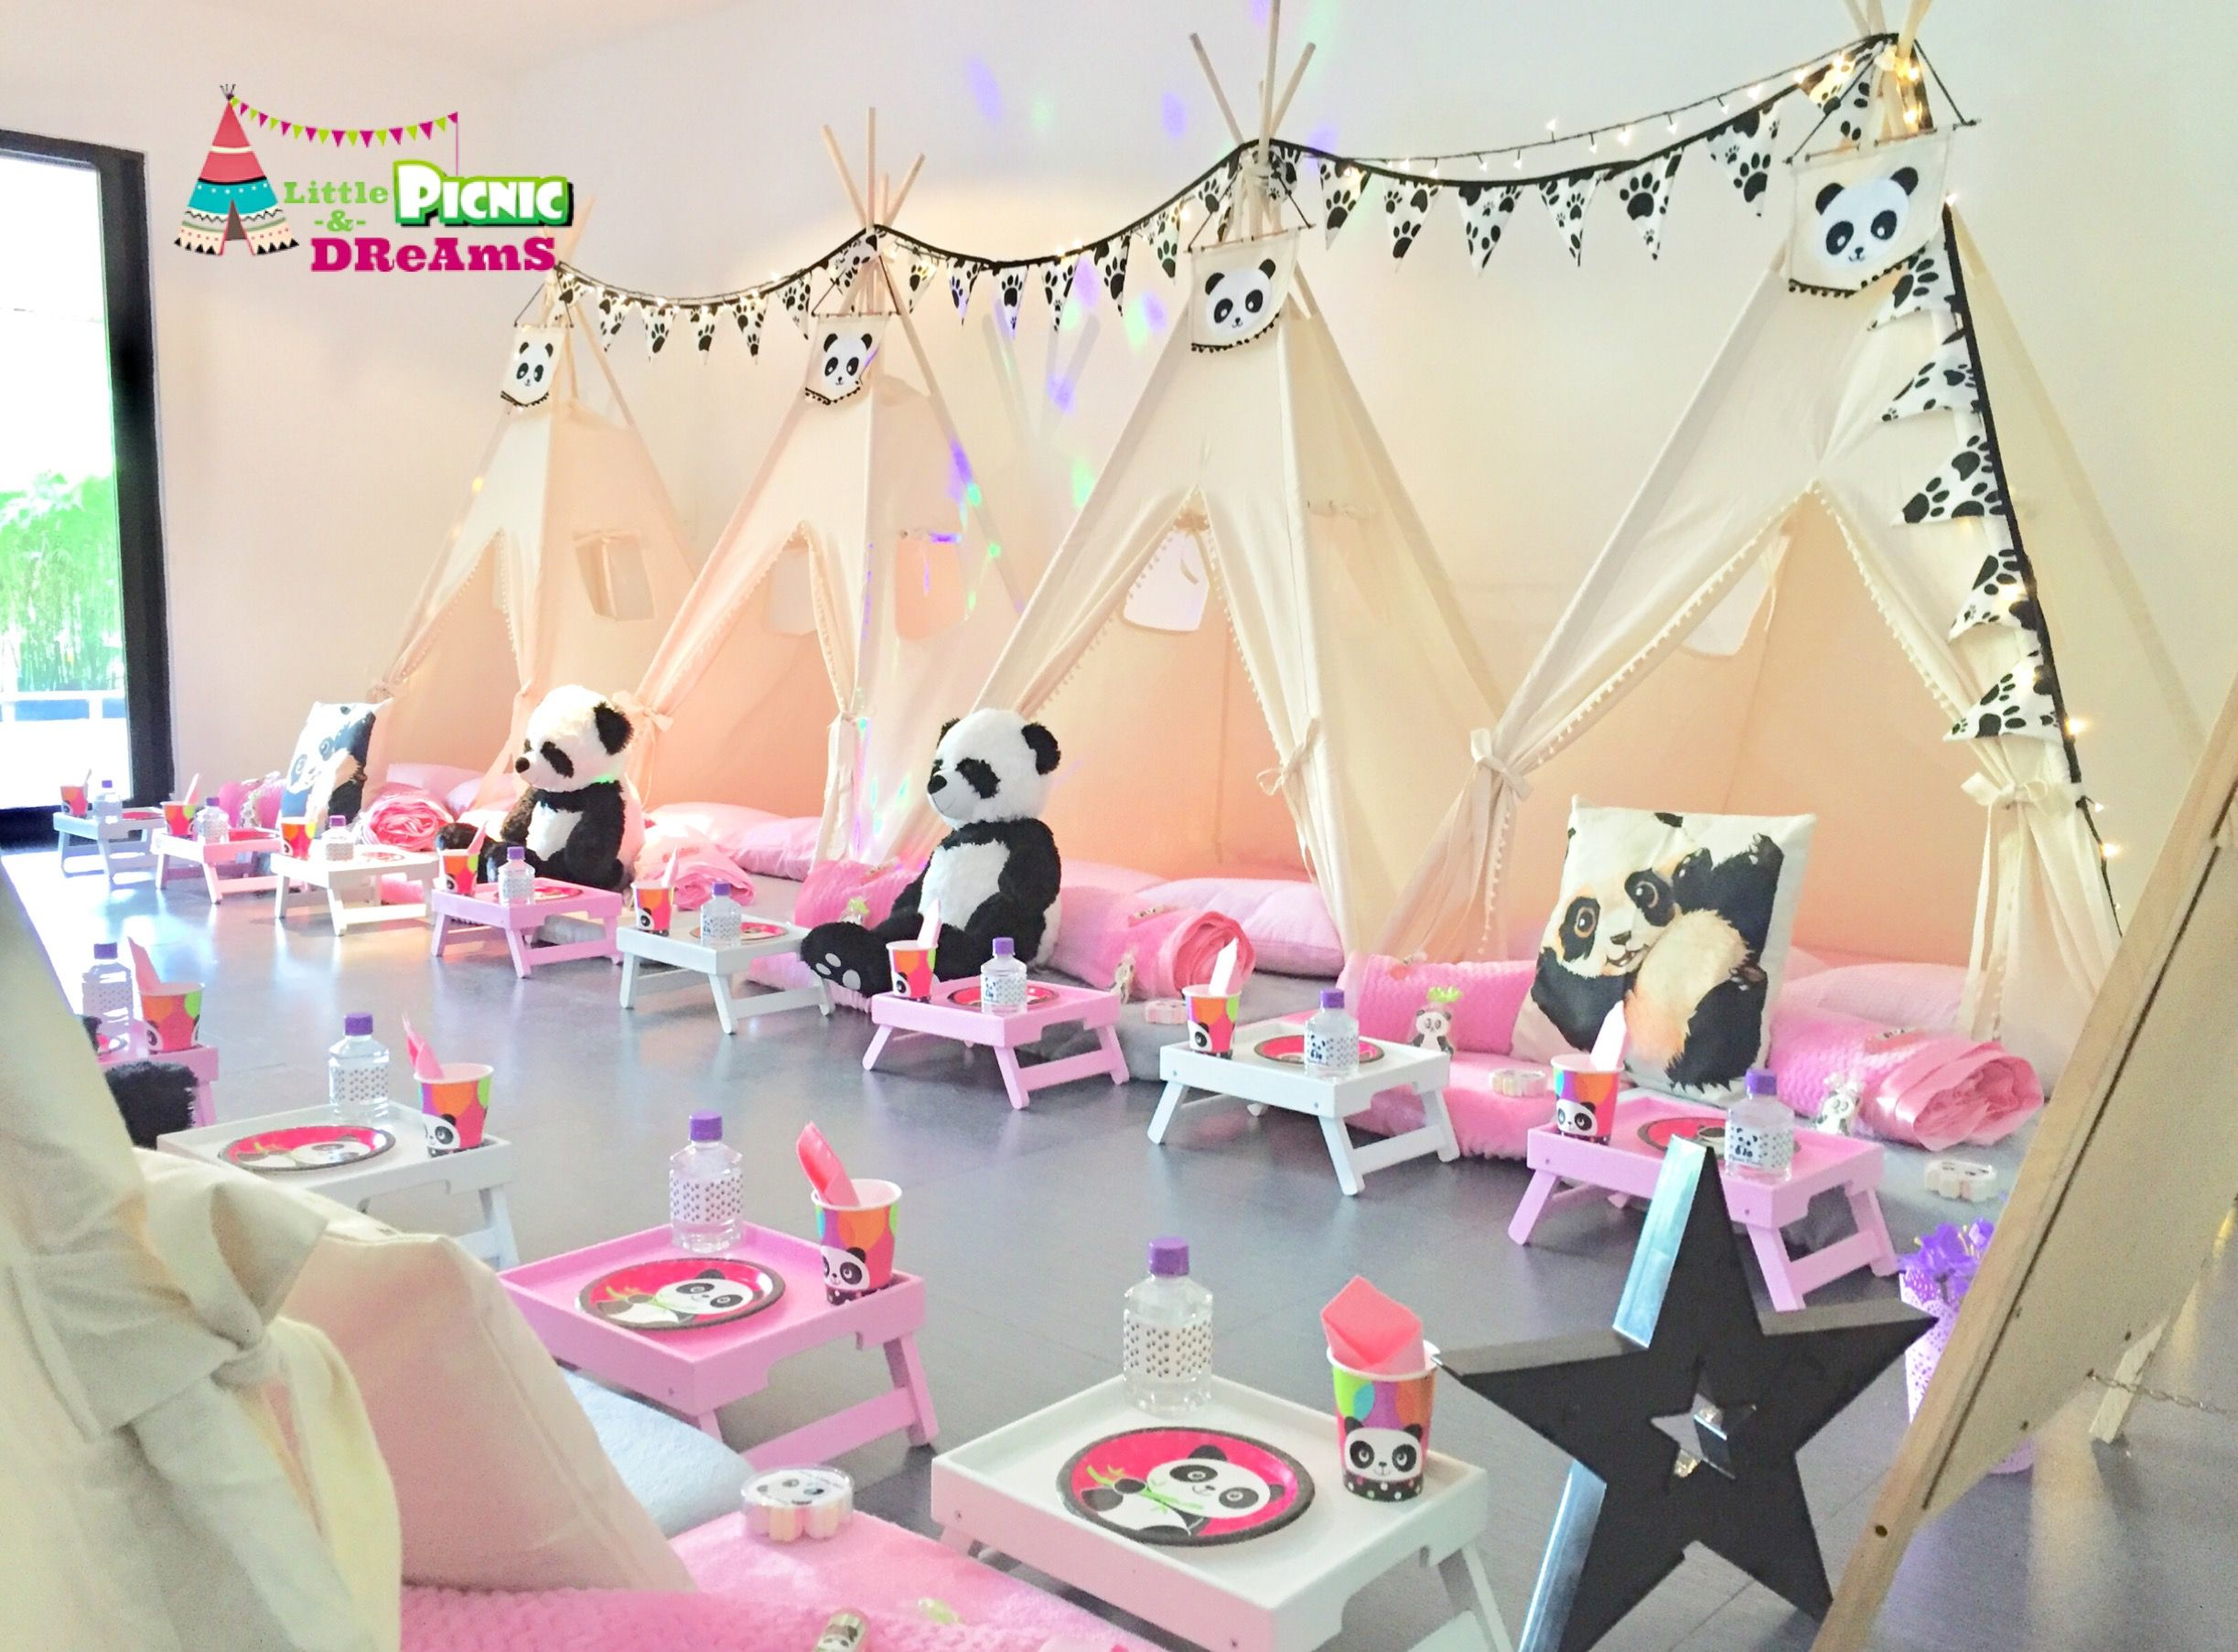 a92d36a5c Fiesta de Pijamas. Pijamada. Pijama Party. SleepOver. Tema  Pandas  www.lpdreams.com  little.picnic  teepees  pijamadas  pijamaparty  sleepover   pandaparty